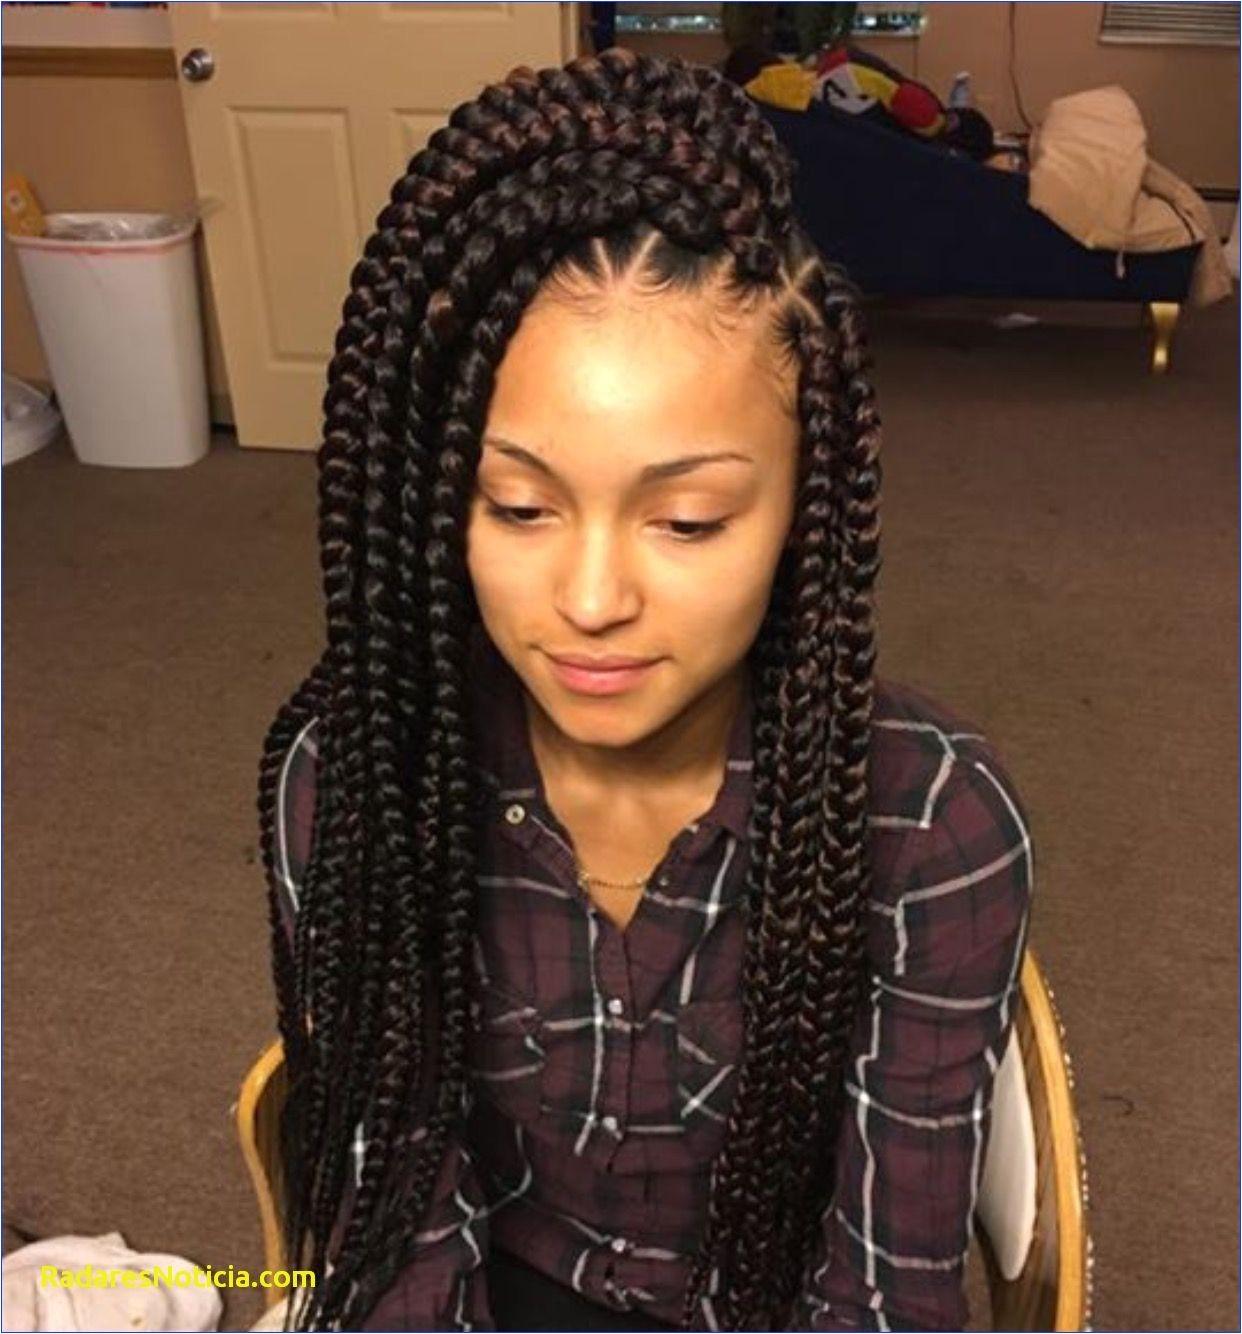 Braided Hairstyles for Short Hair Inspirational Braided Hairstyles for Grey Hair